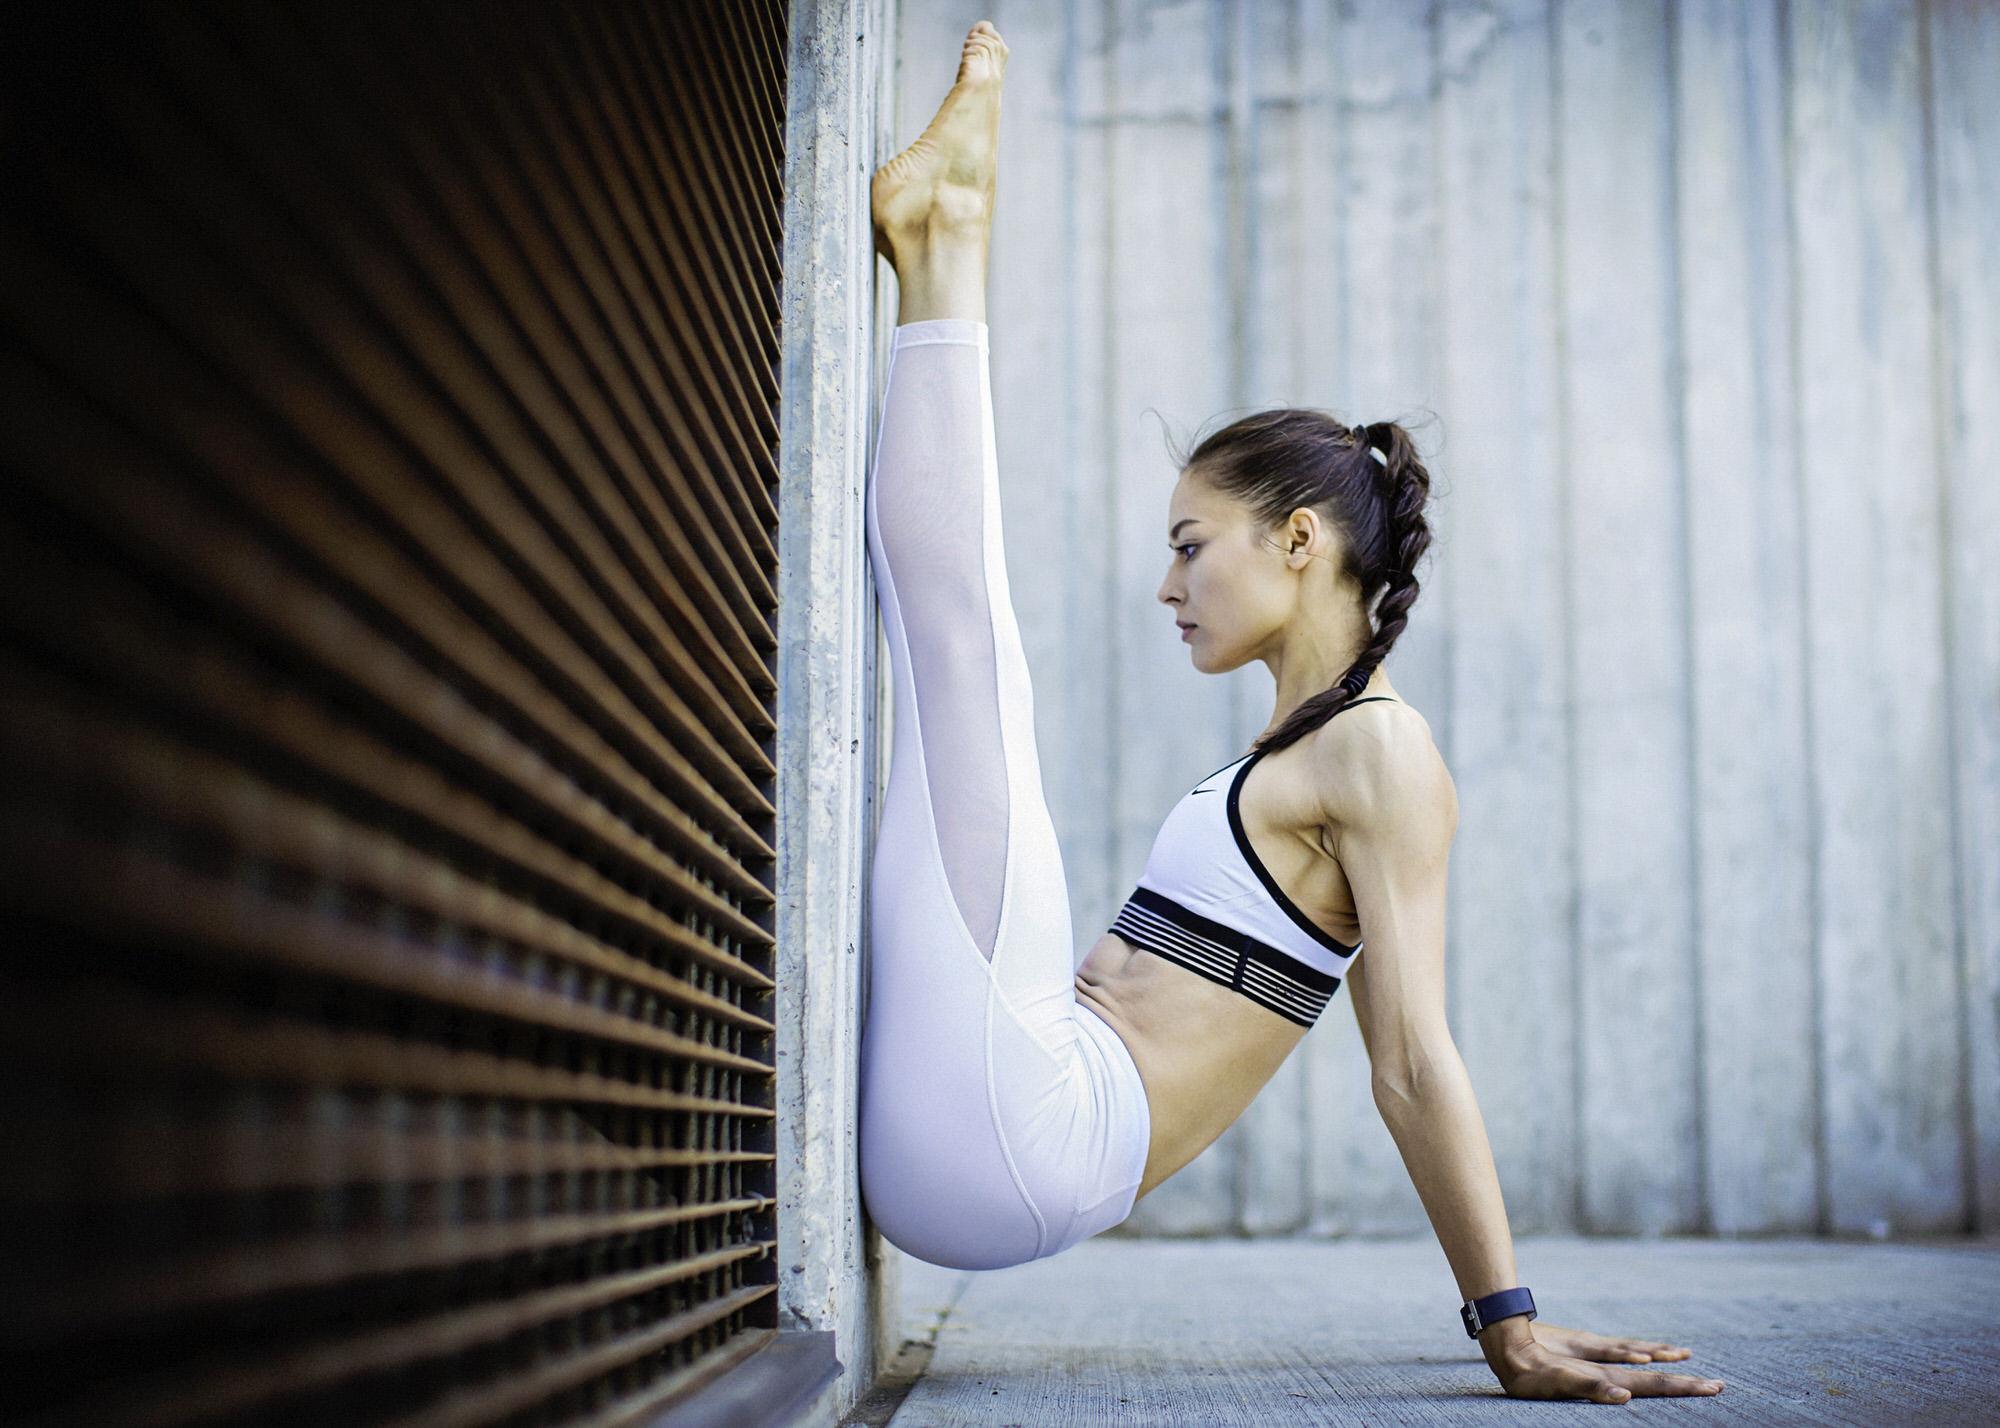 This was an athletic portfolio photo shoot featuring Katya Gudaeva